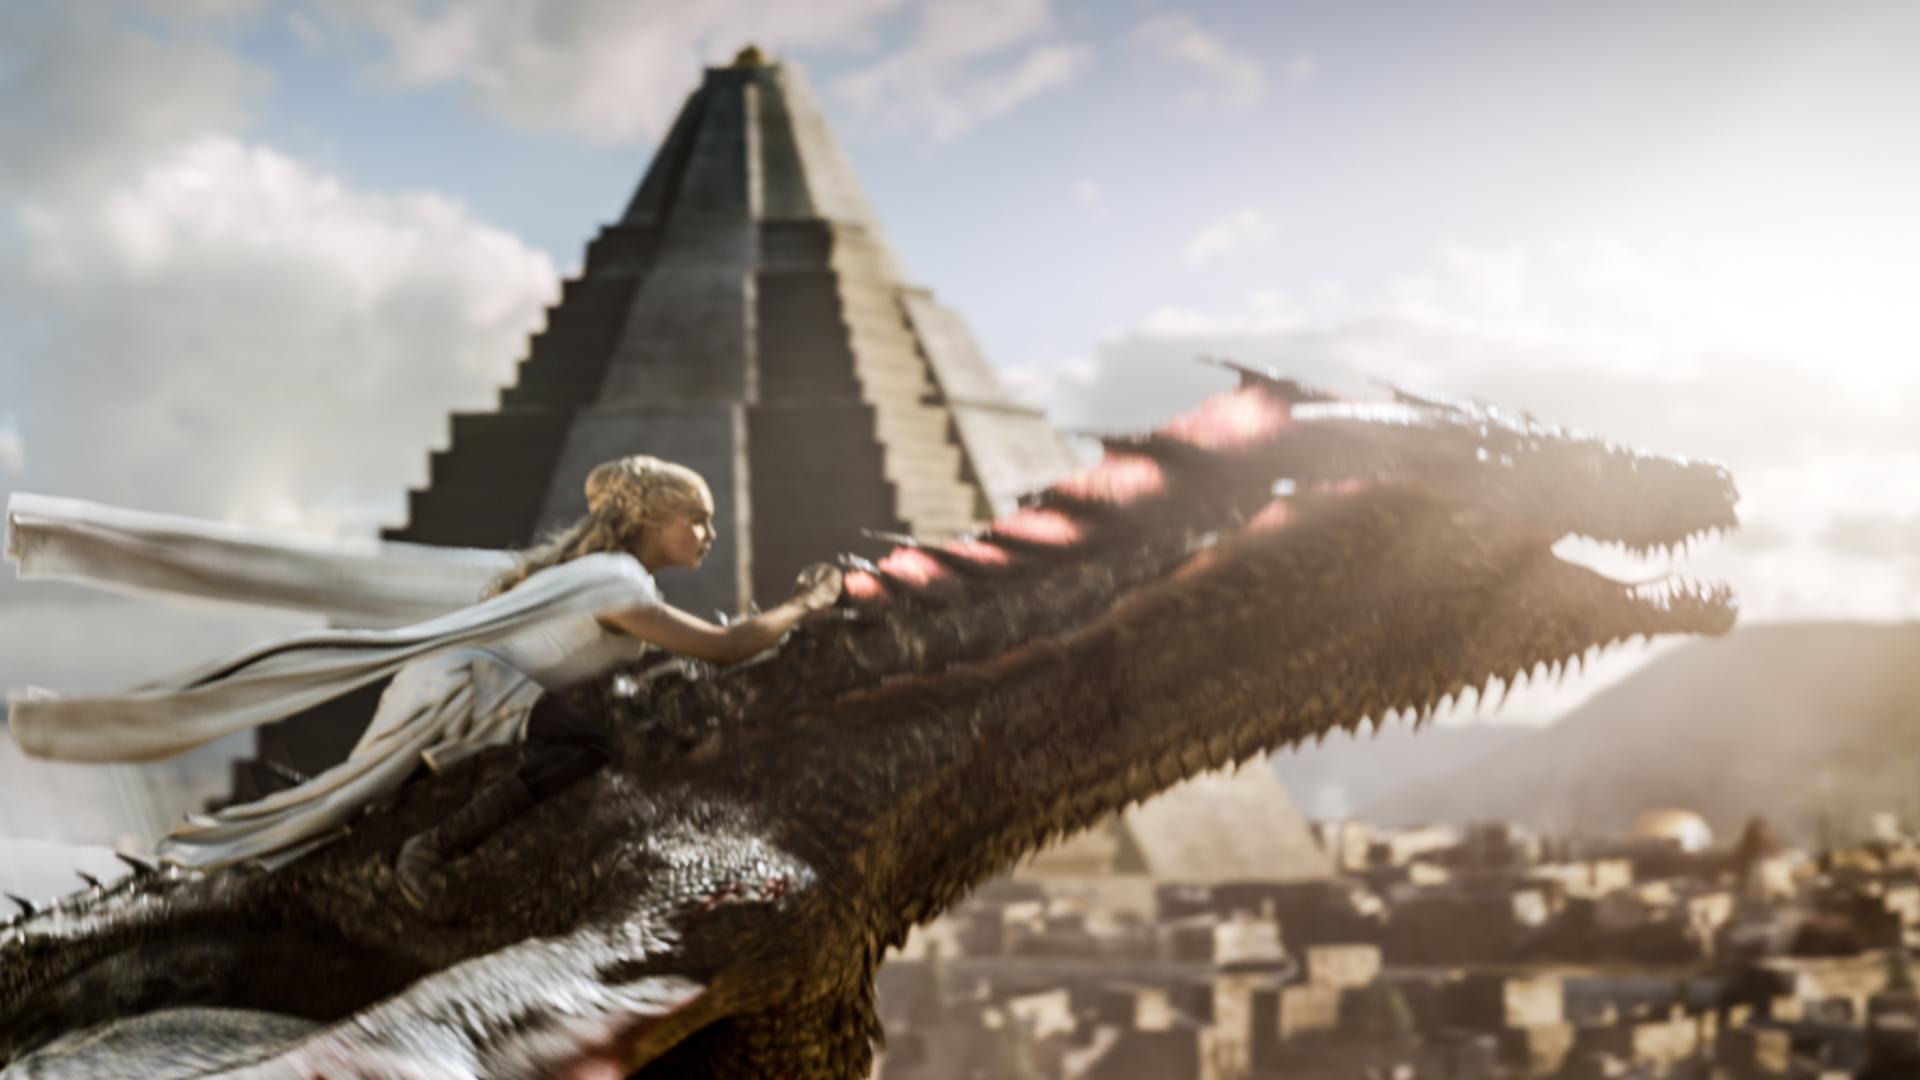 Game of thrones season 6 episode 10 summary